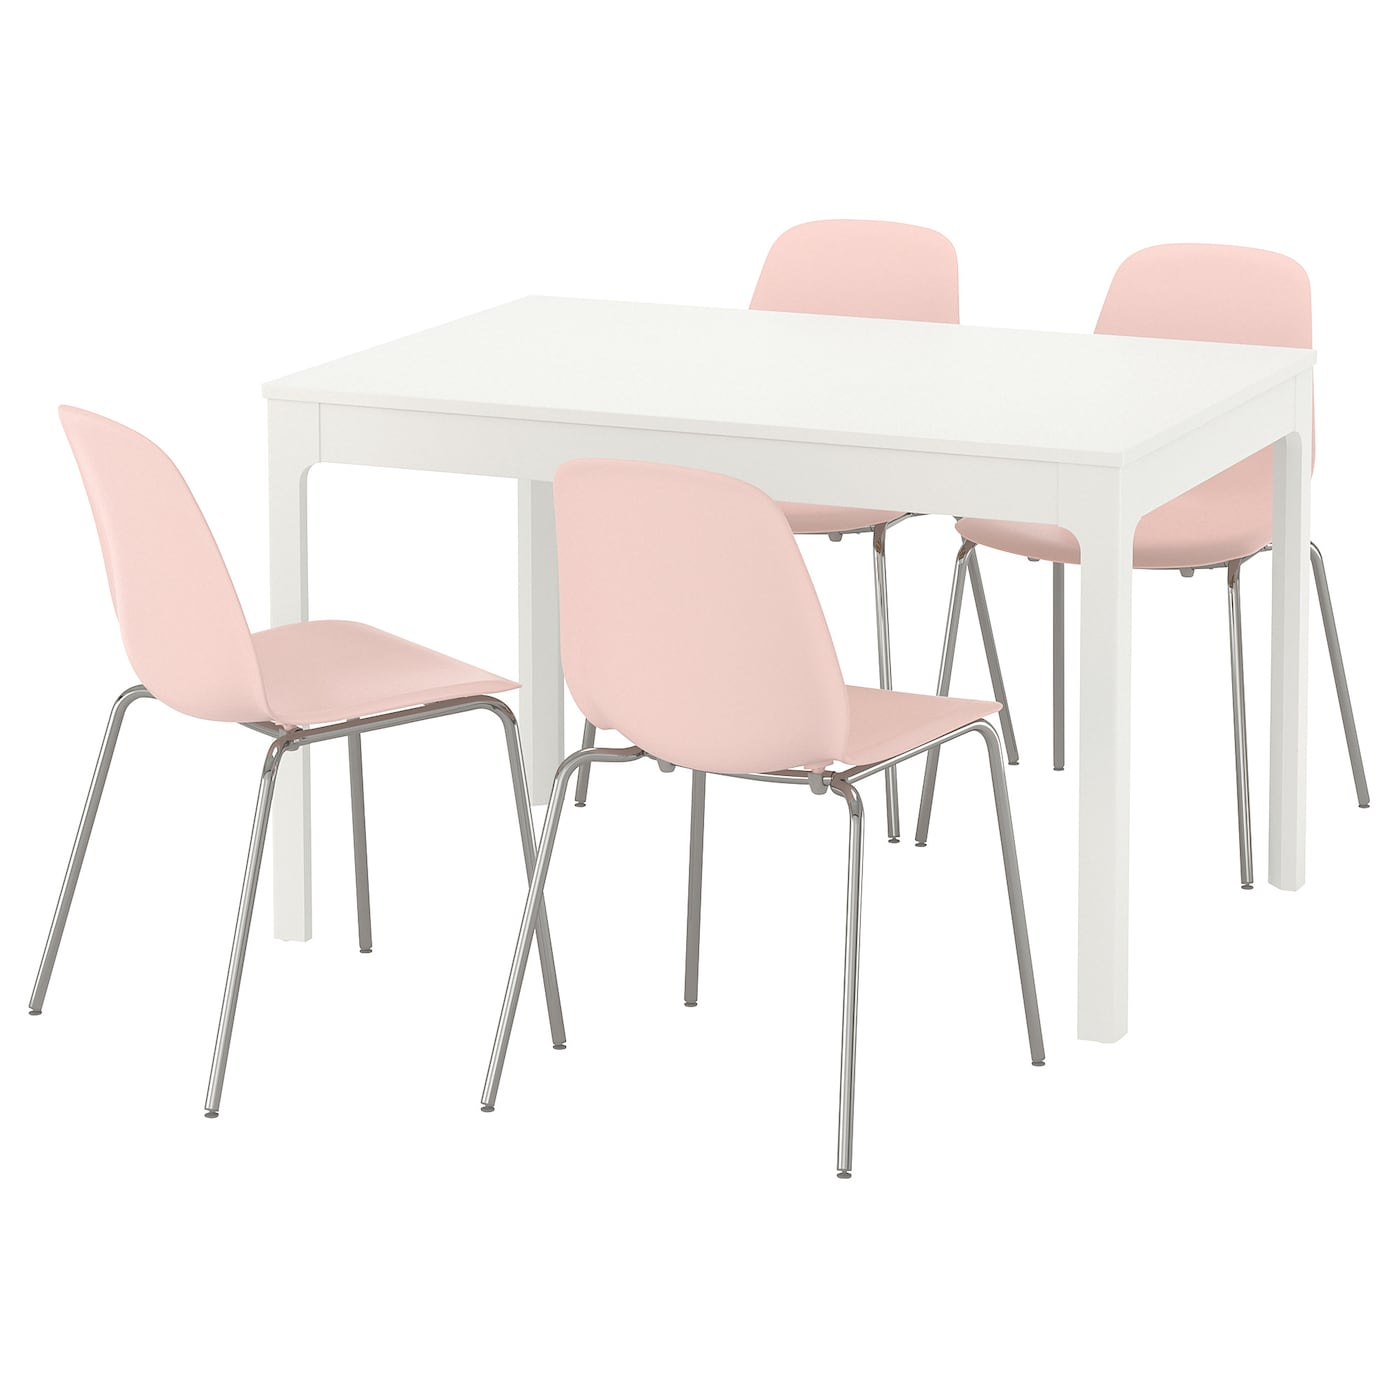 LEIFARNE/EKEDALEN Mesa con 4 sillas Blanco/rosa 120 cm - IKEA